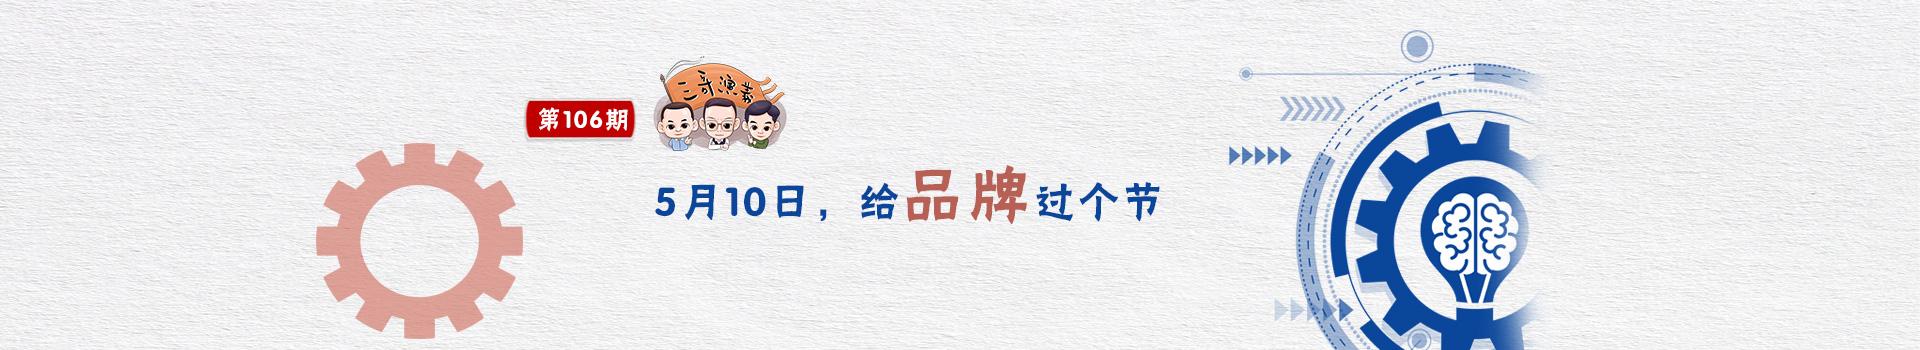 No.106三哥演义